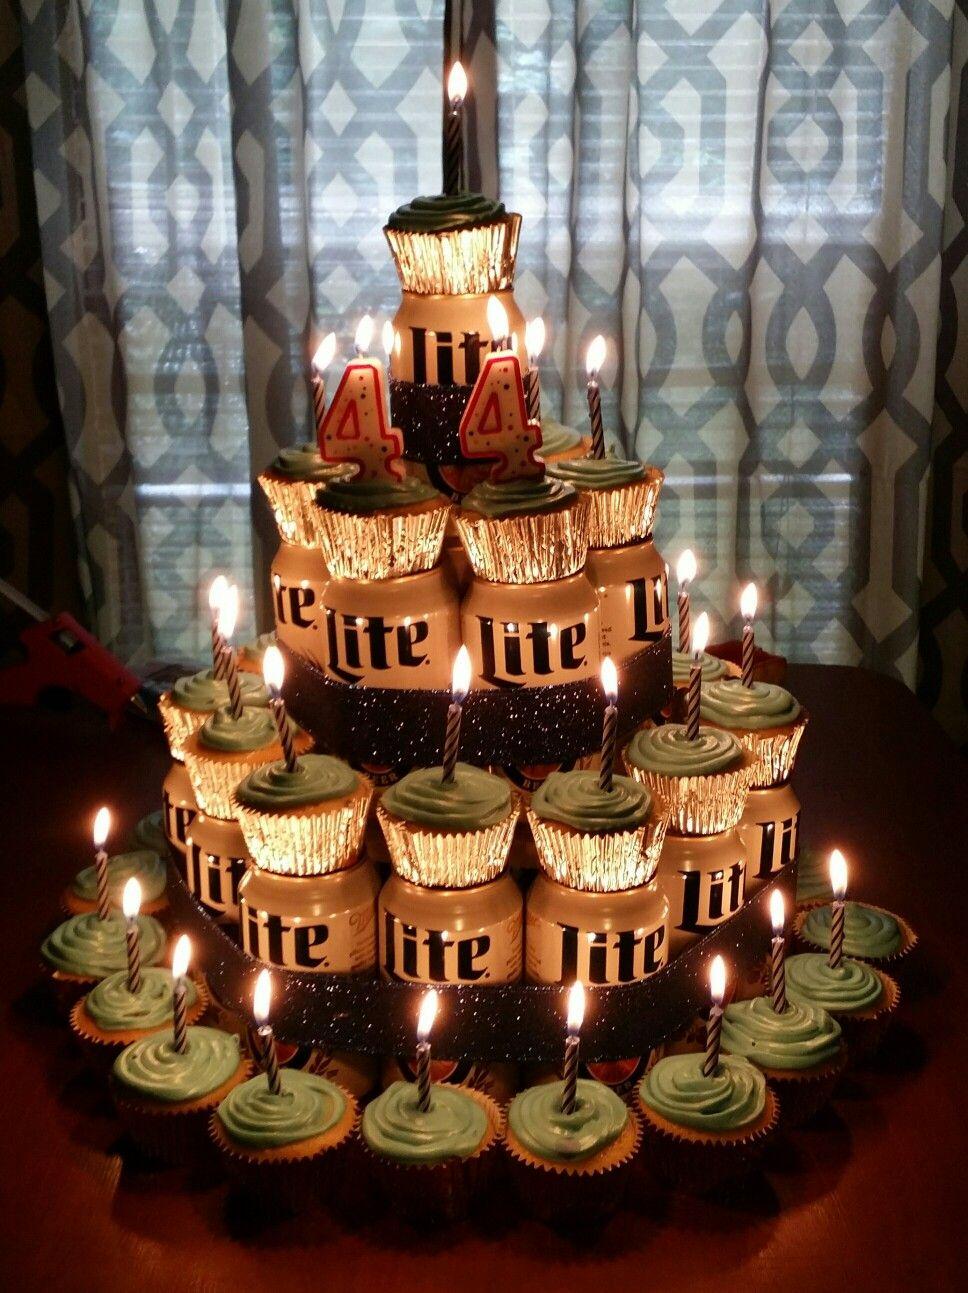 Hubby S Birthday Cake Birthday Beer Cake Beer Birthday Party Beer Birthday